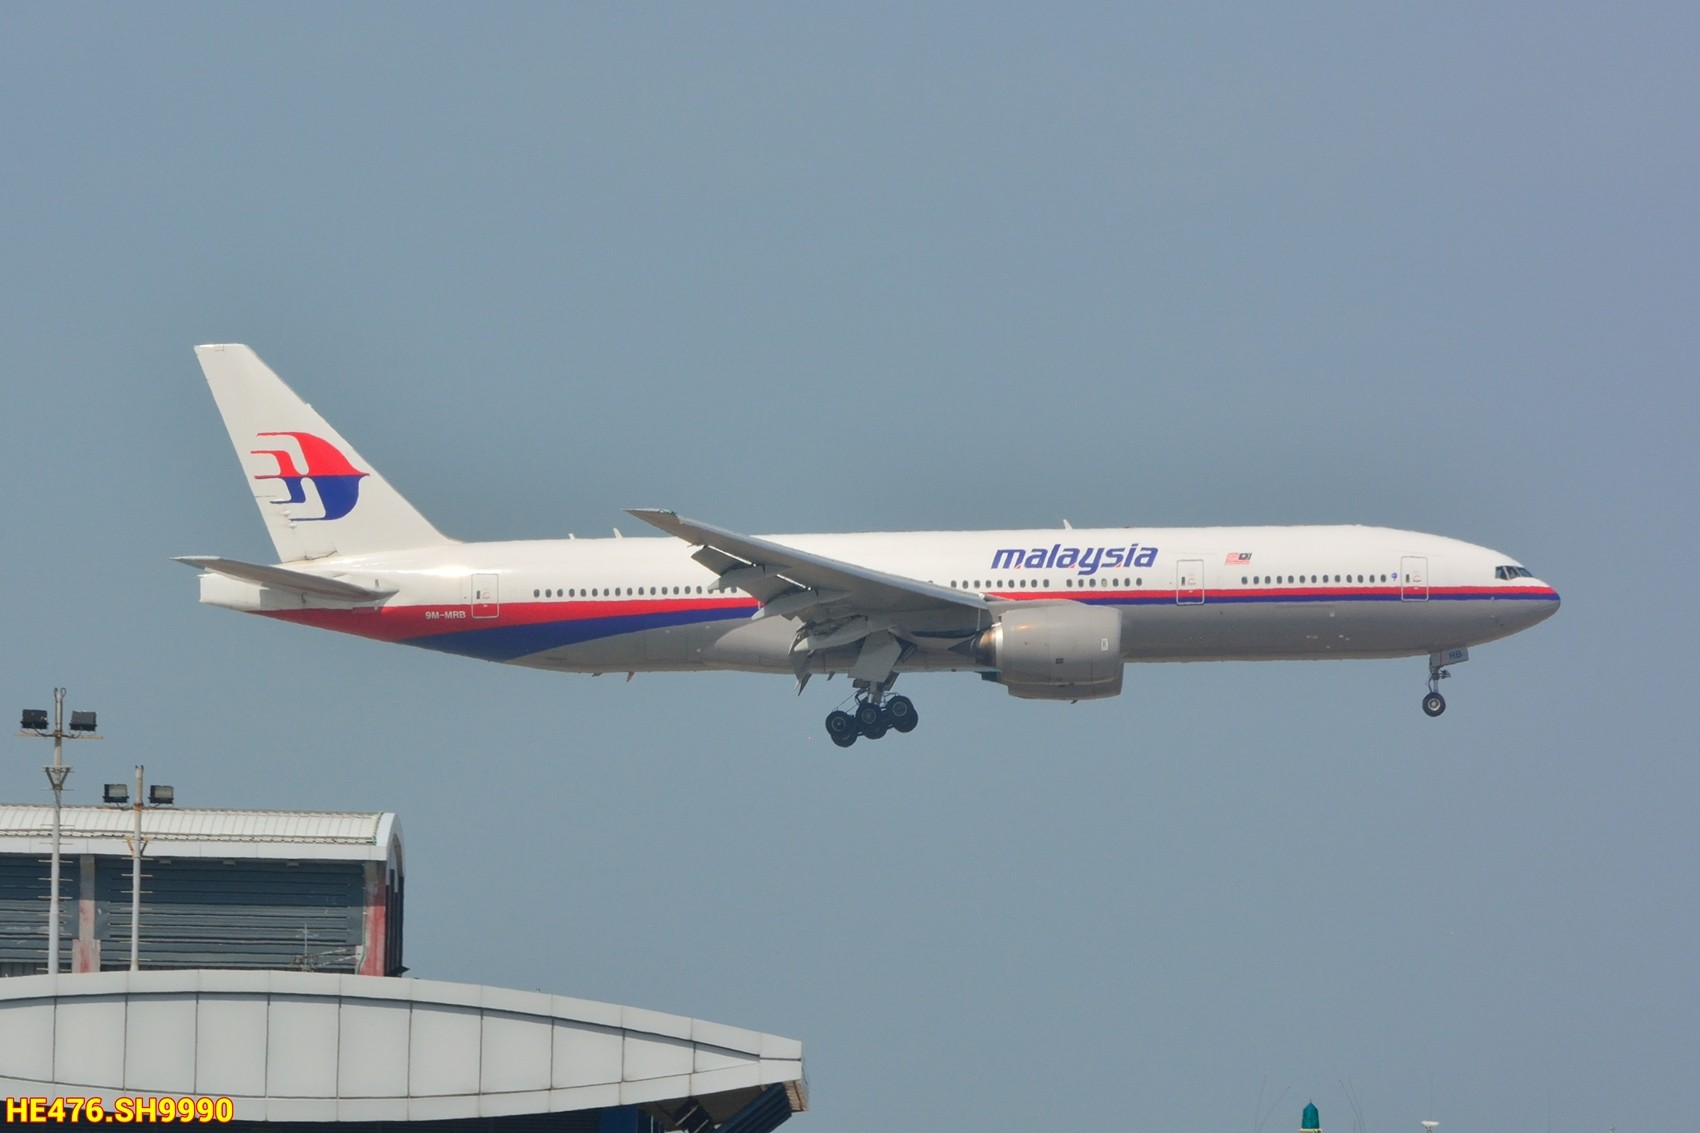 Re:[原创]今天香港HAECO閒攝 BOEING 777-200 9M-MRB 中国香港赤鱲角机场